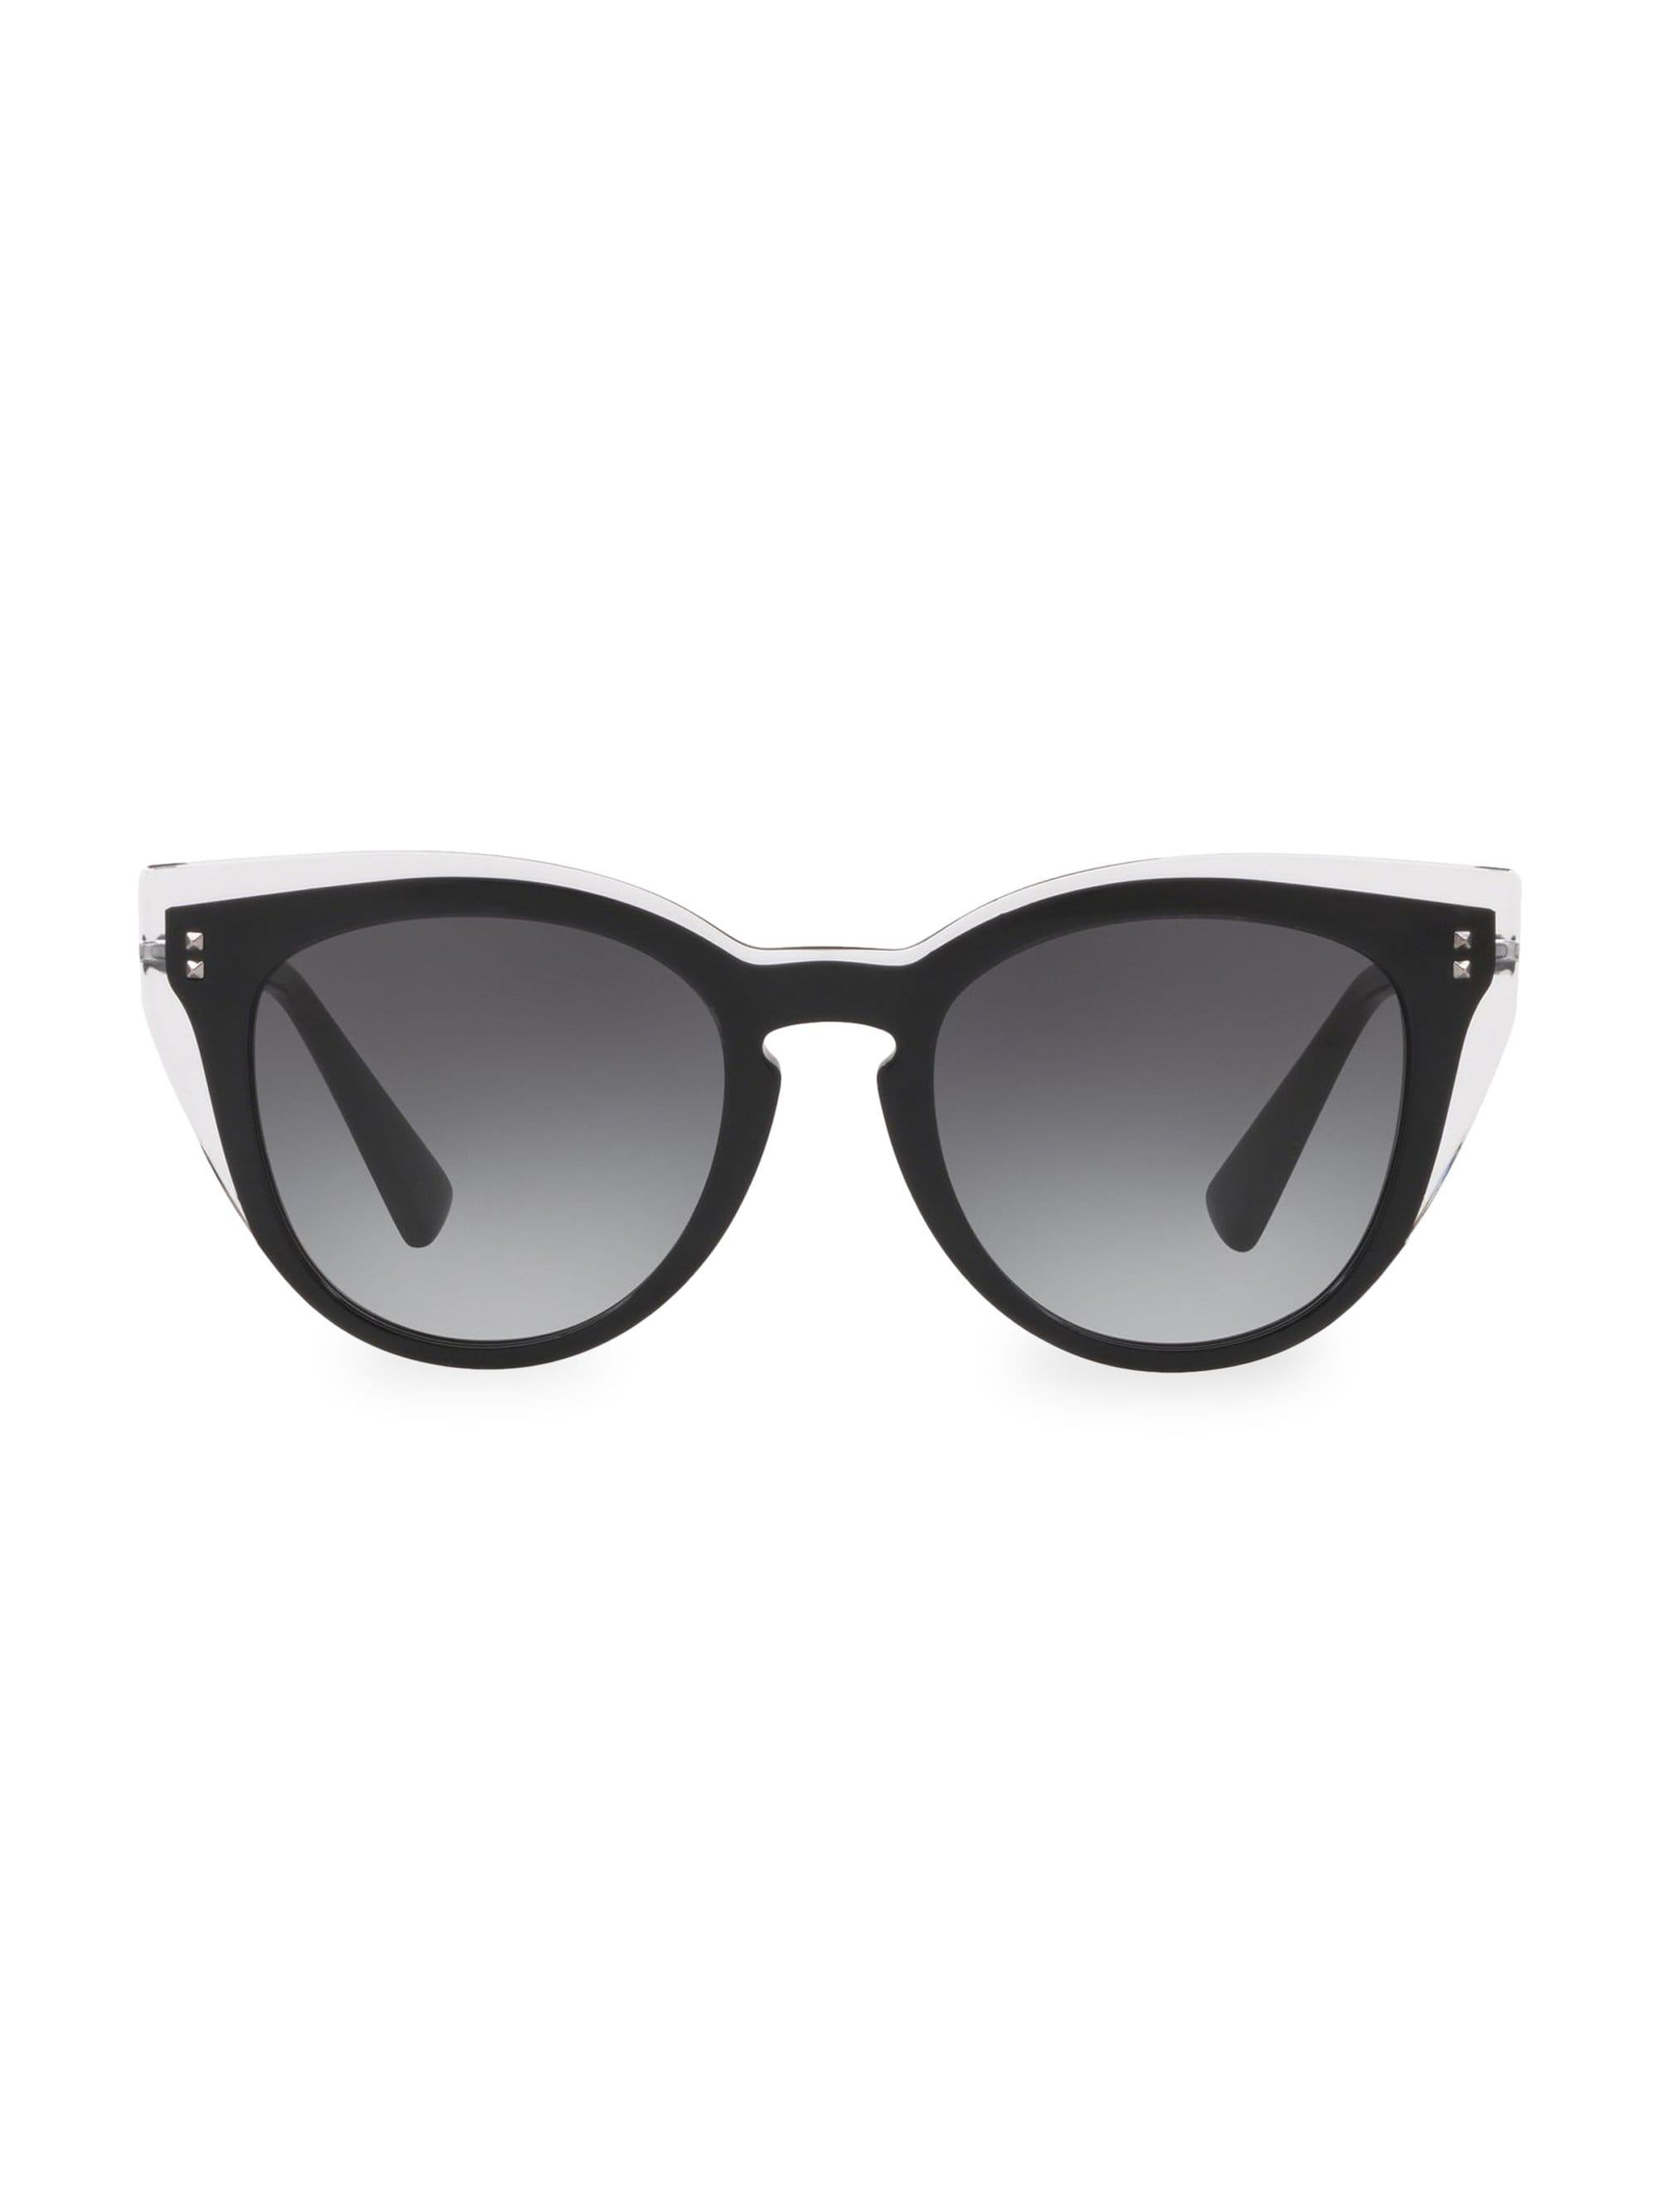 e137262faba Valentino 50mm Cat Eye Sunglasses in Black - Lyst